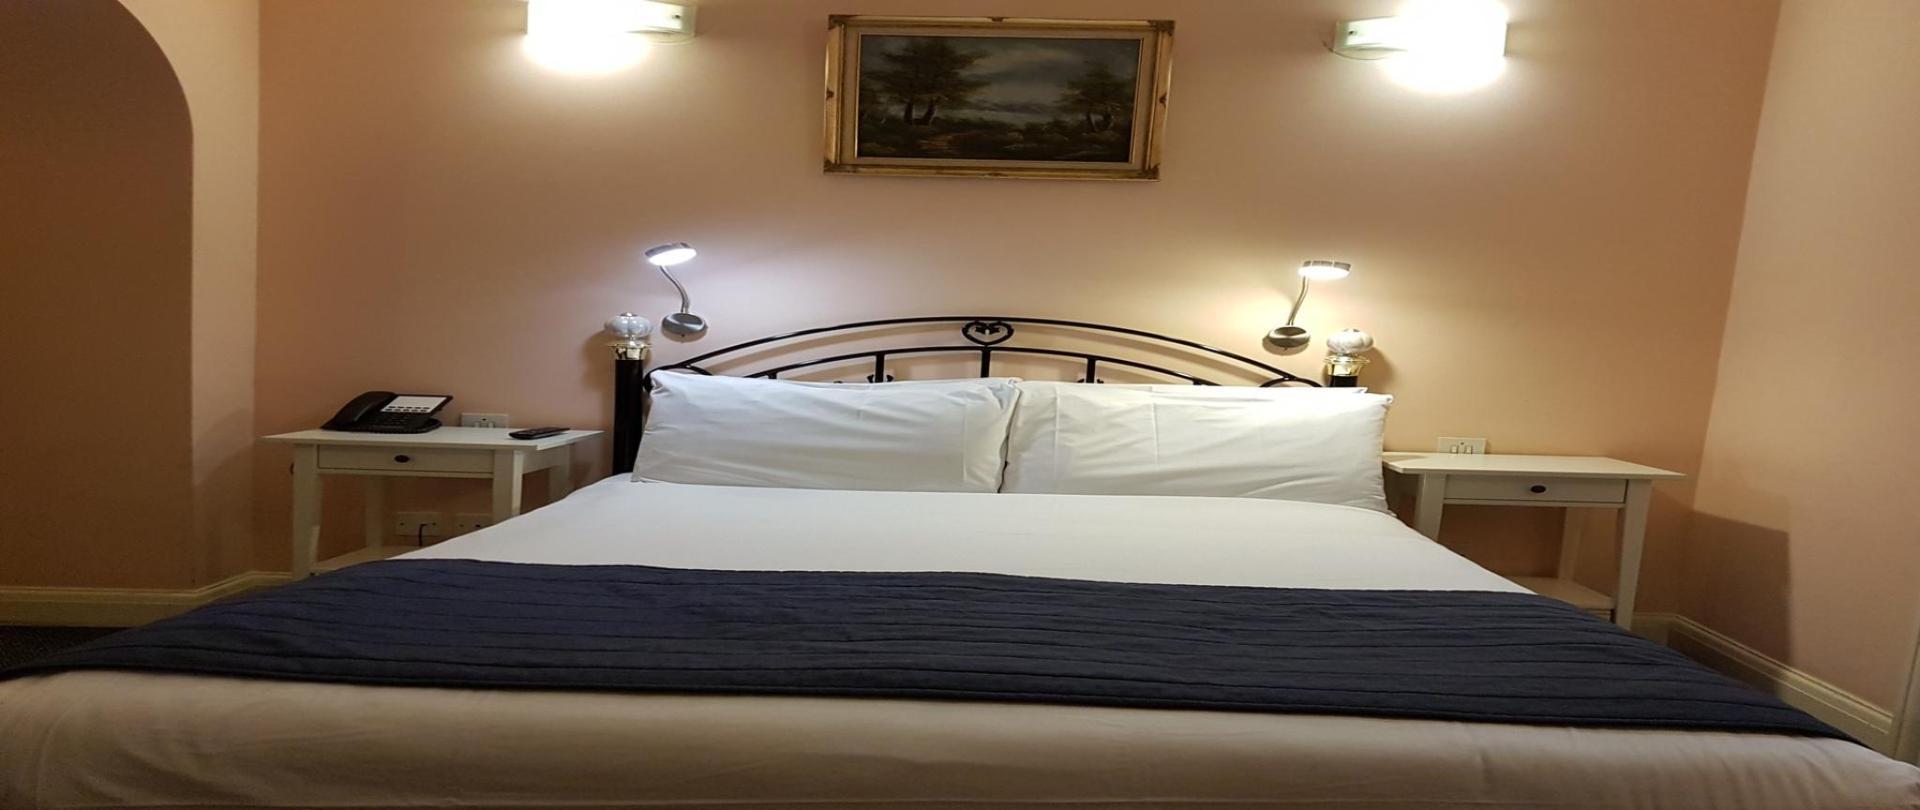 rsz_bedroom2.jpg